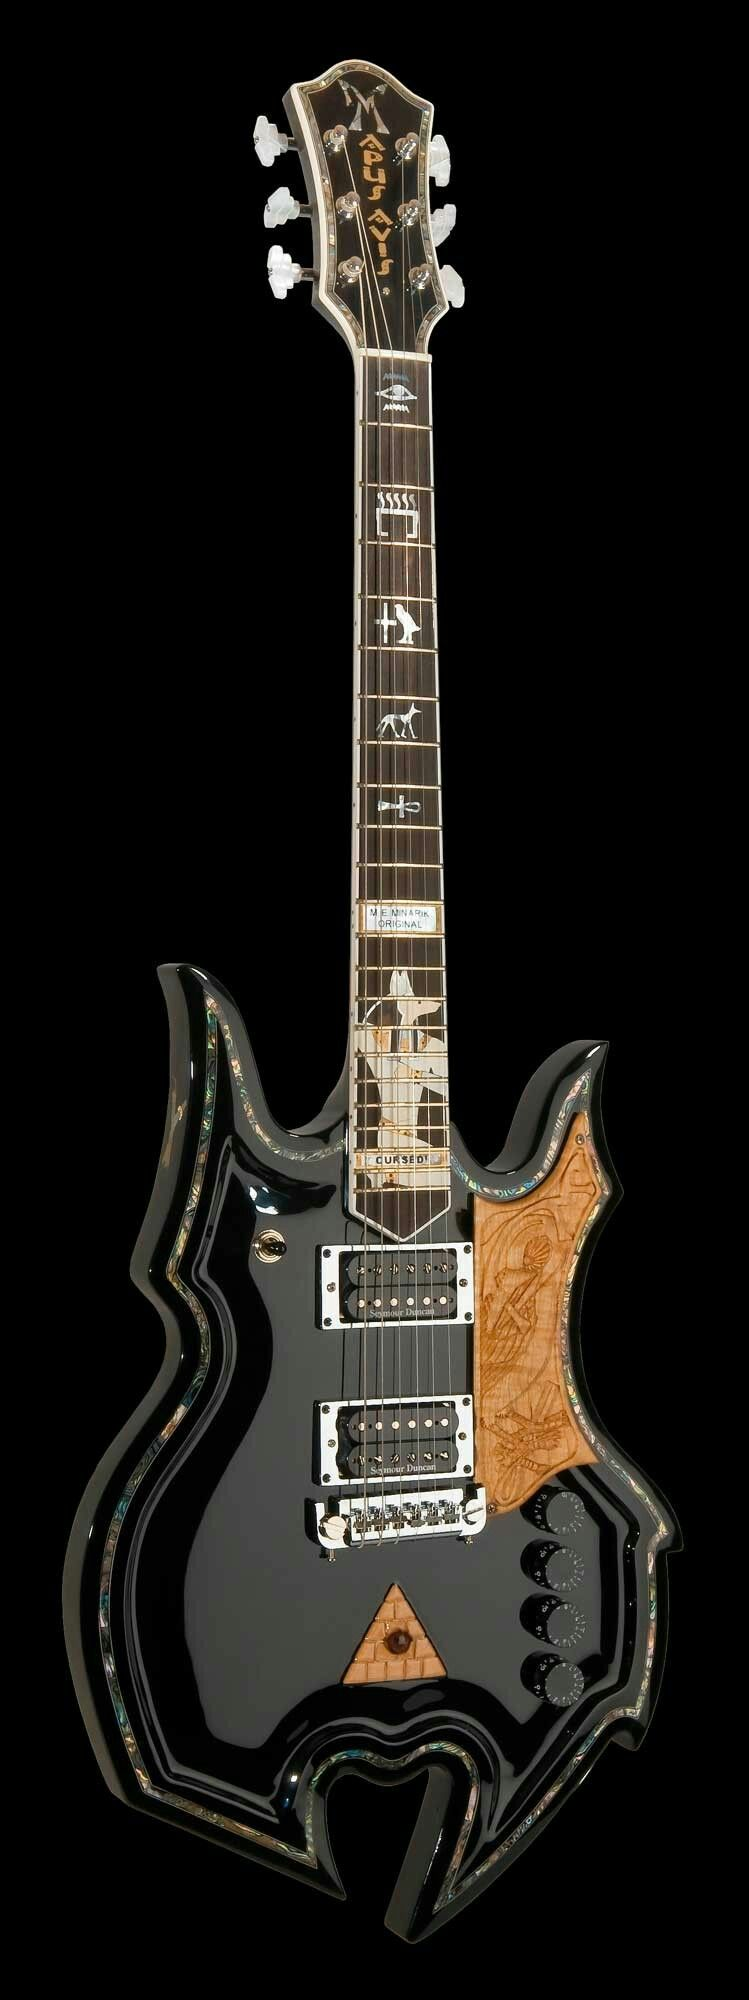 Diablo minarik guitars 2